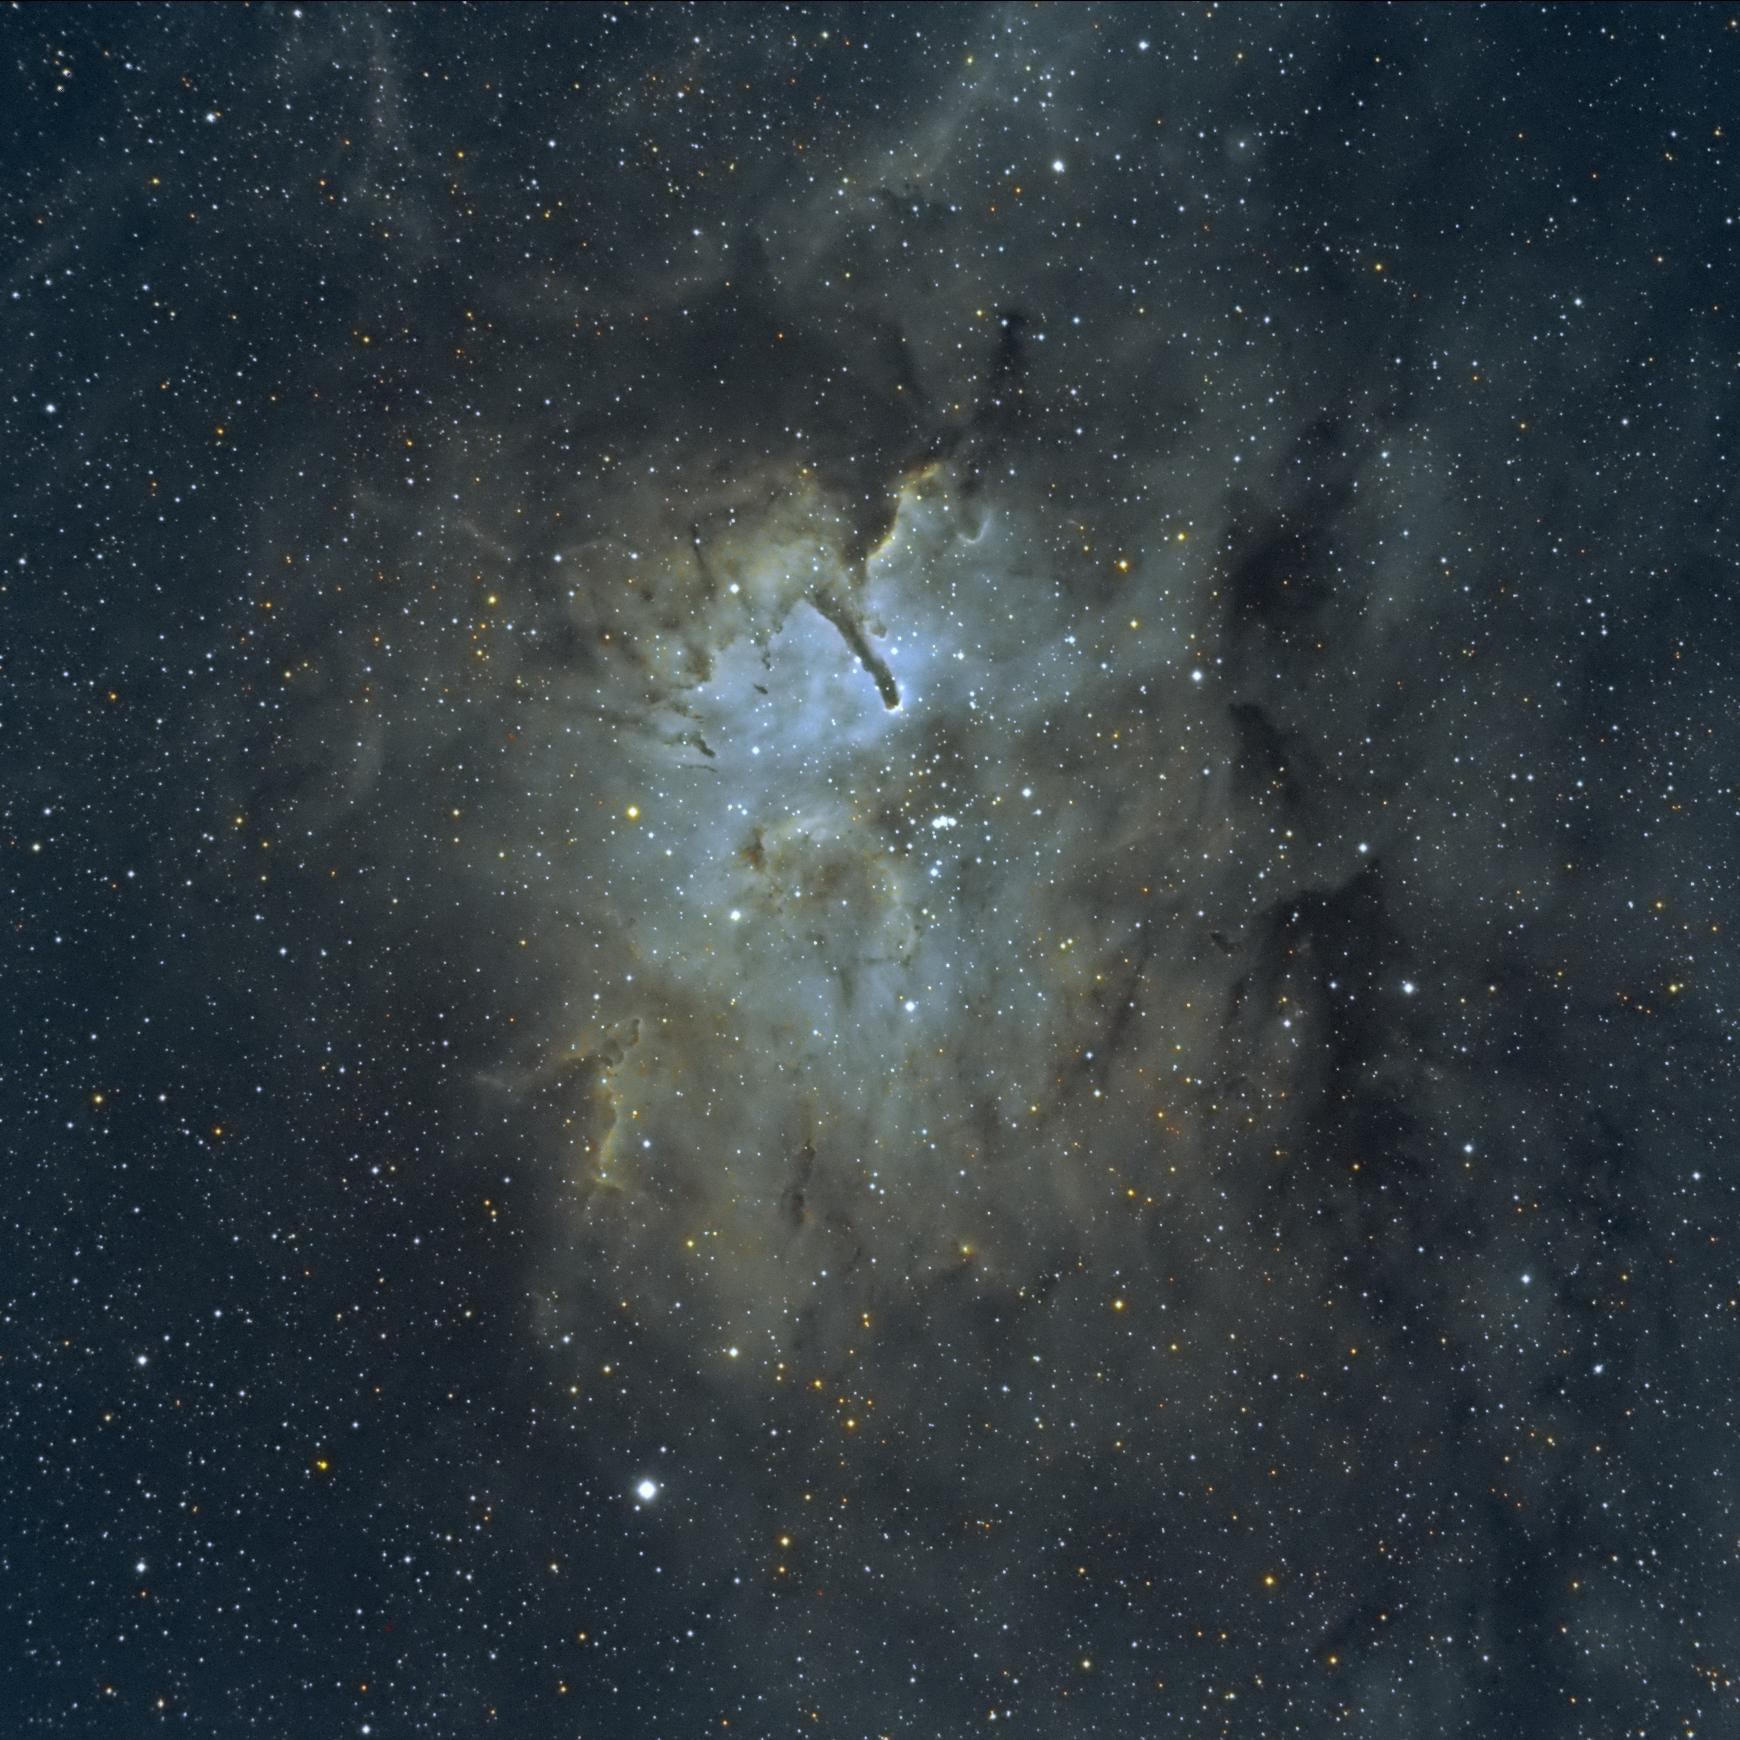 NGC6820_2015_2012_SHO9x10minHa_17x10minHa_5xS2_7xO3_5